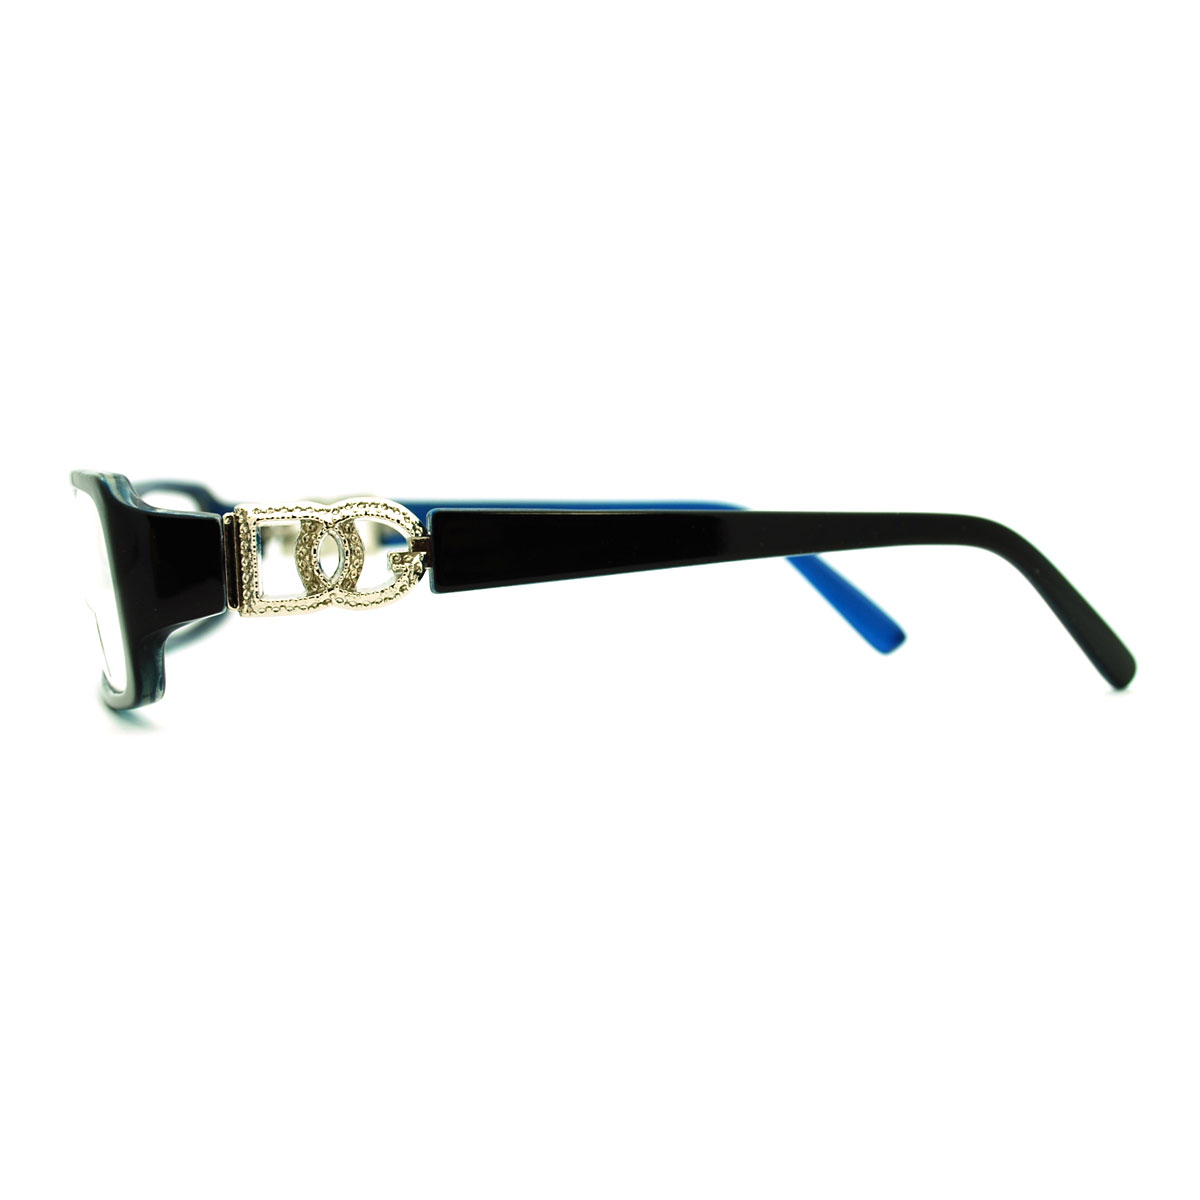 Glasses Narrow Frame : Womens Sexy Extra Narrow Rectangular Plastic Frame Eye ...